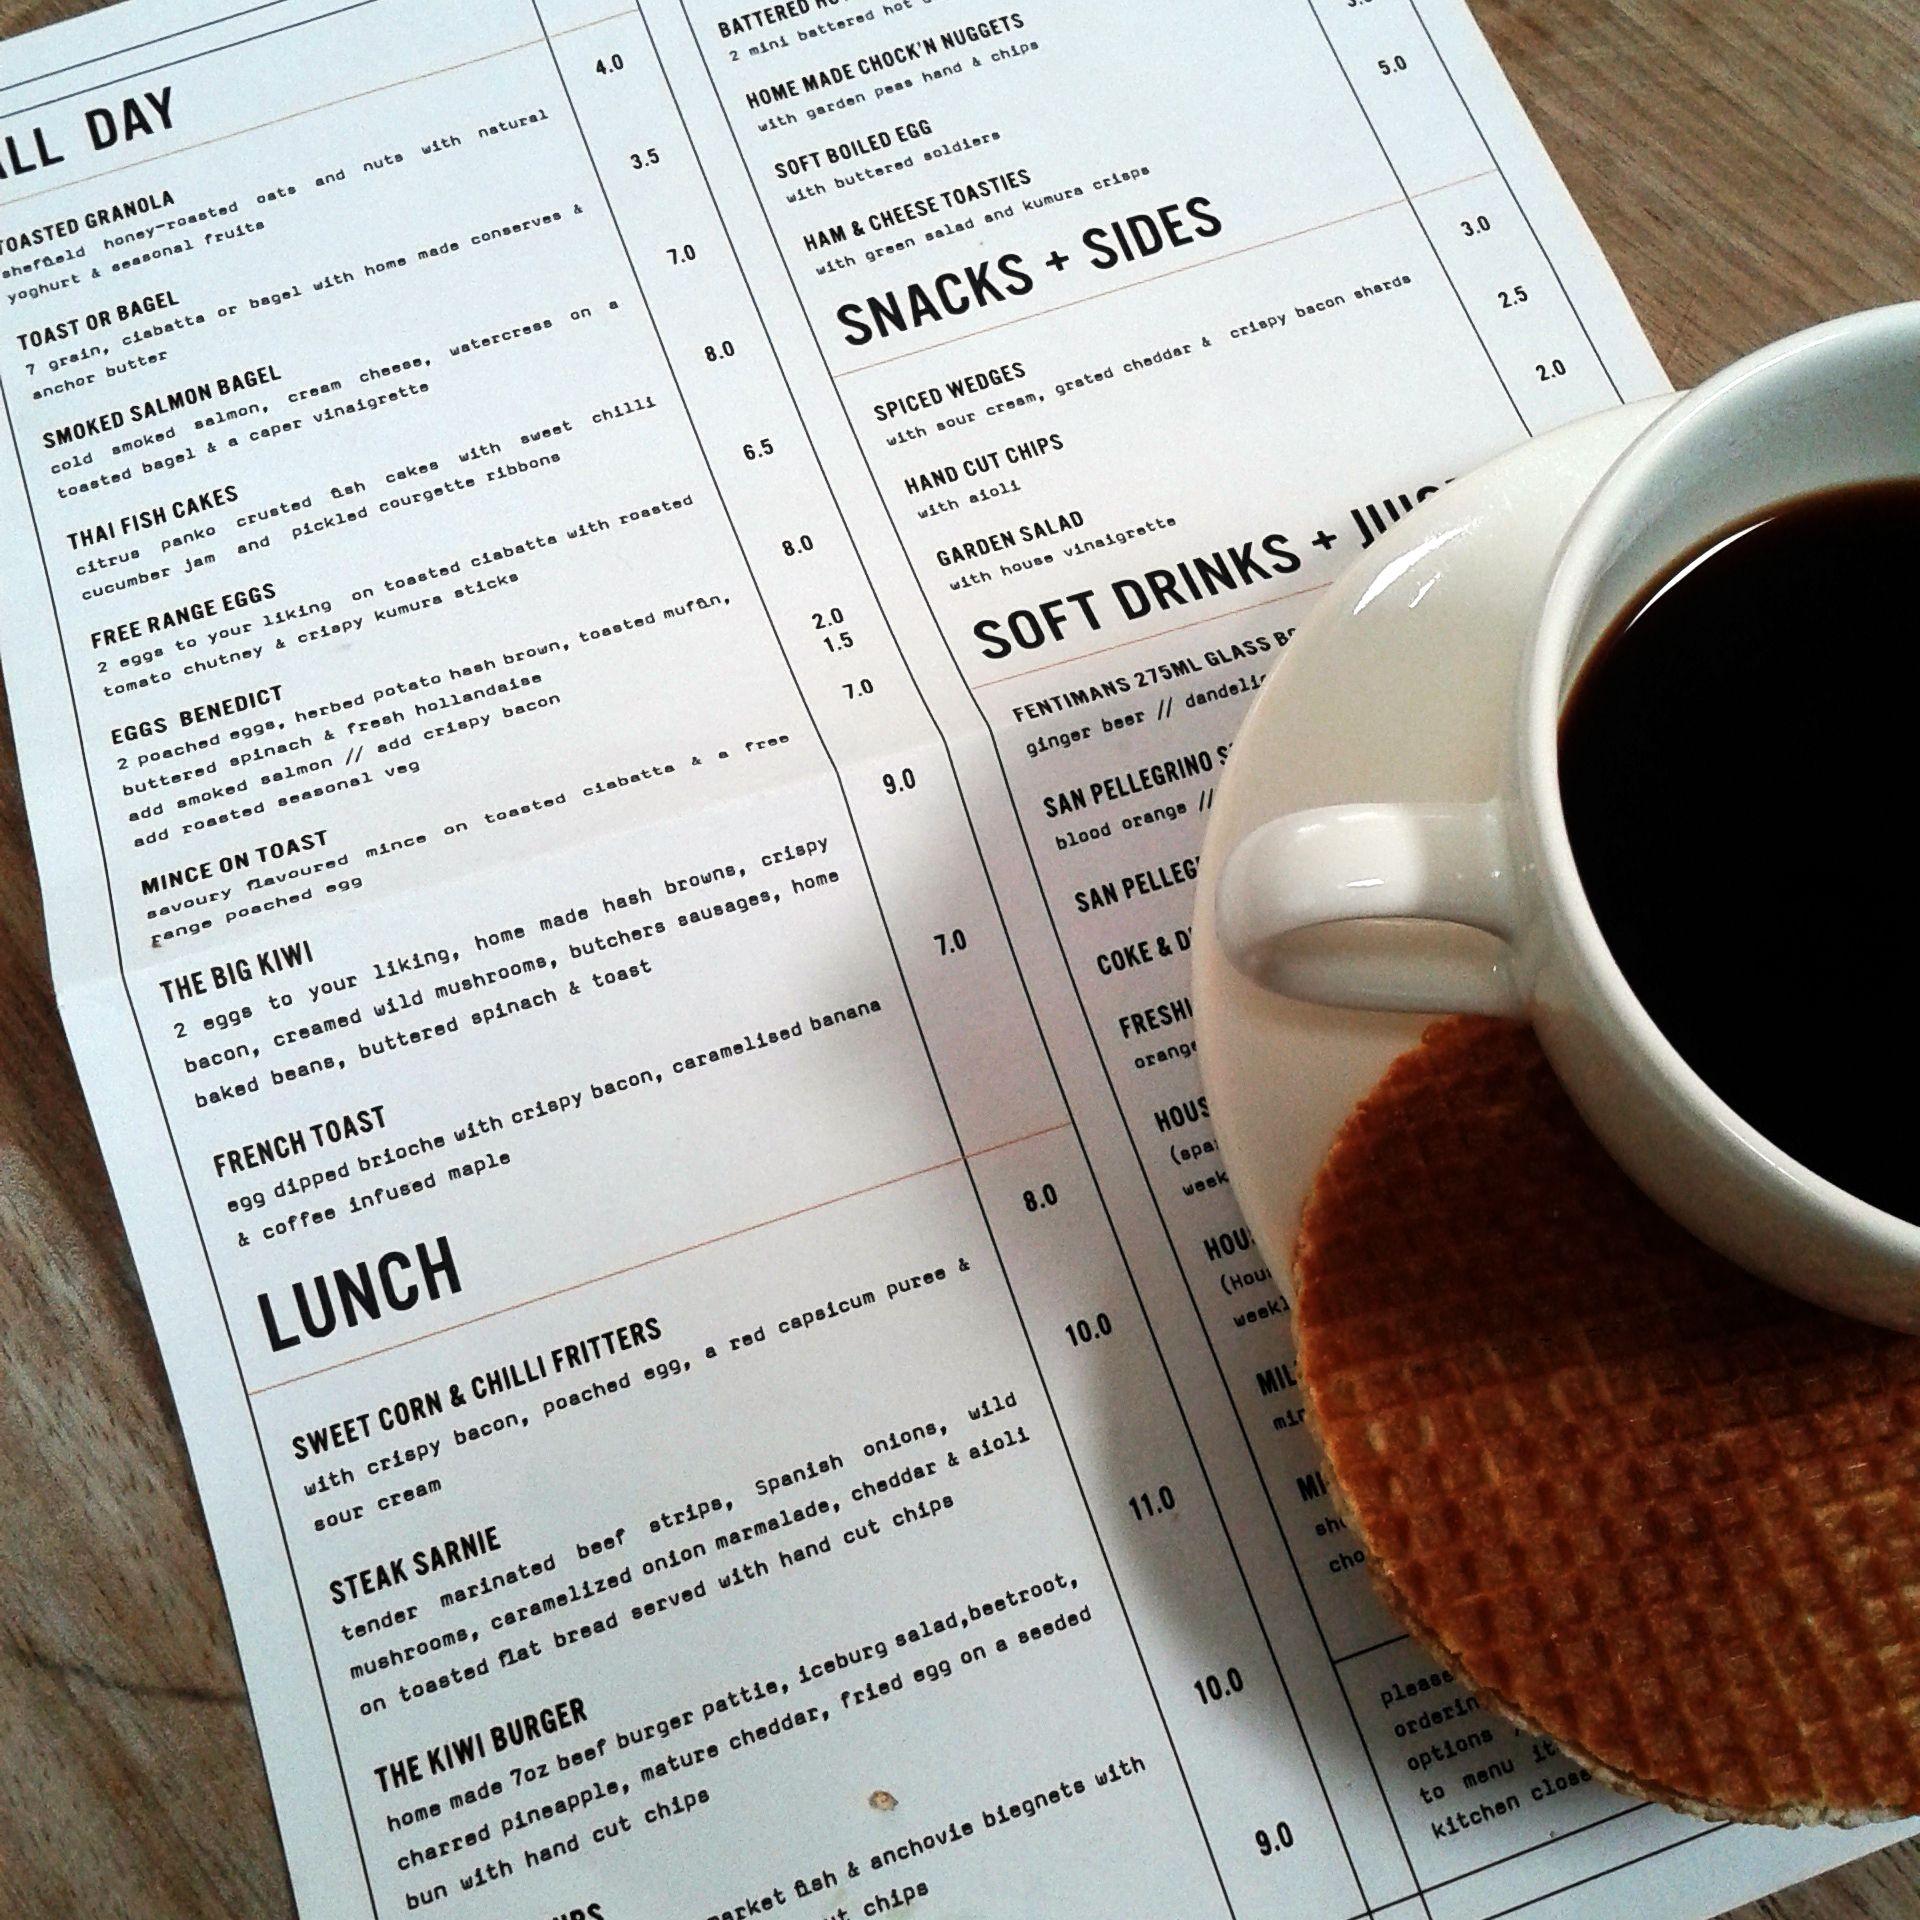 Pin by Eskarina Andwika on NudgeGraphics for Cafes & Restaurants | Coffee shop menu, Menu design ...